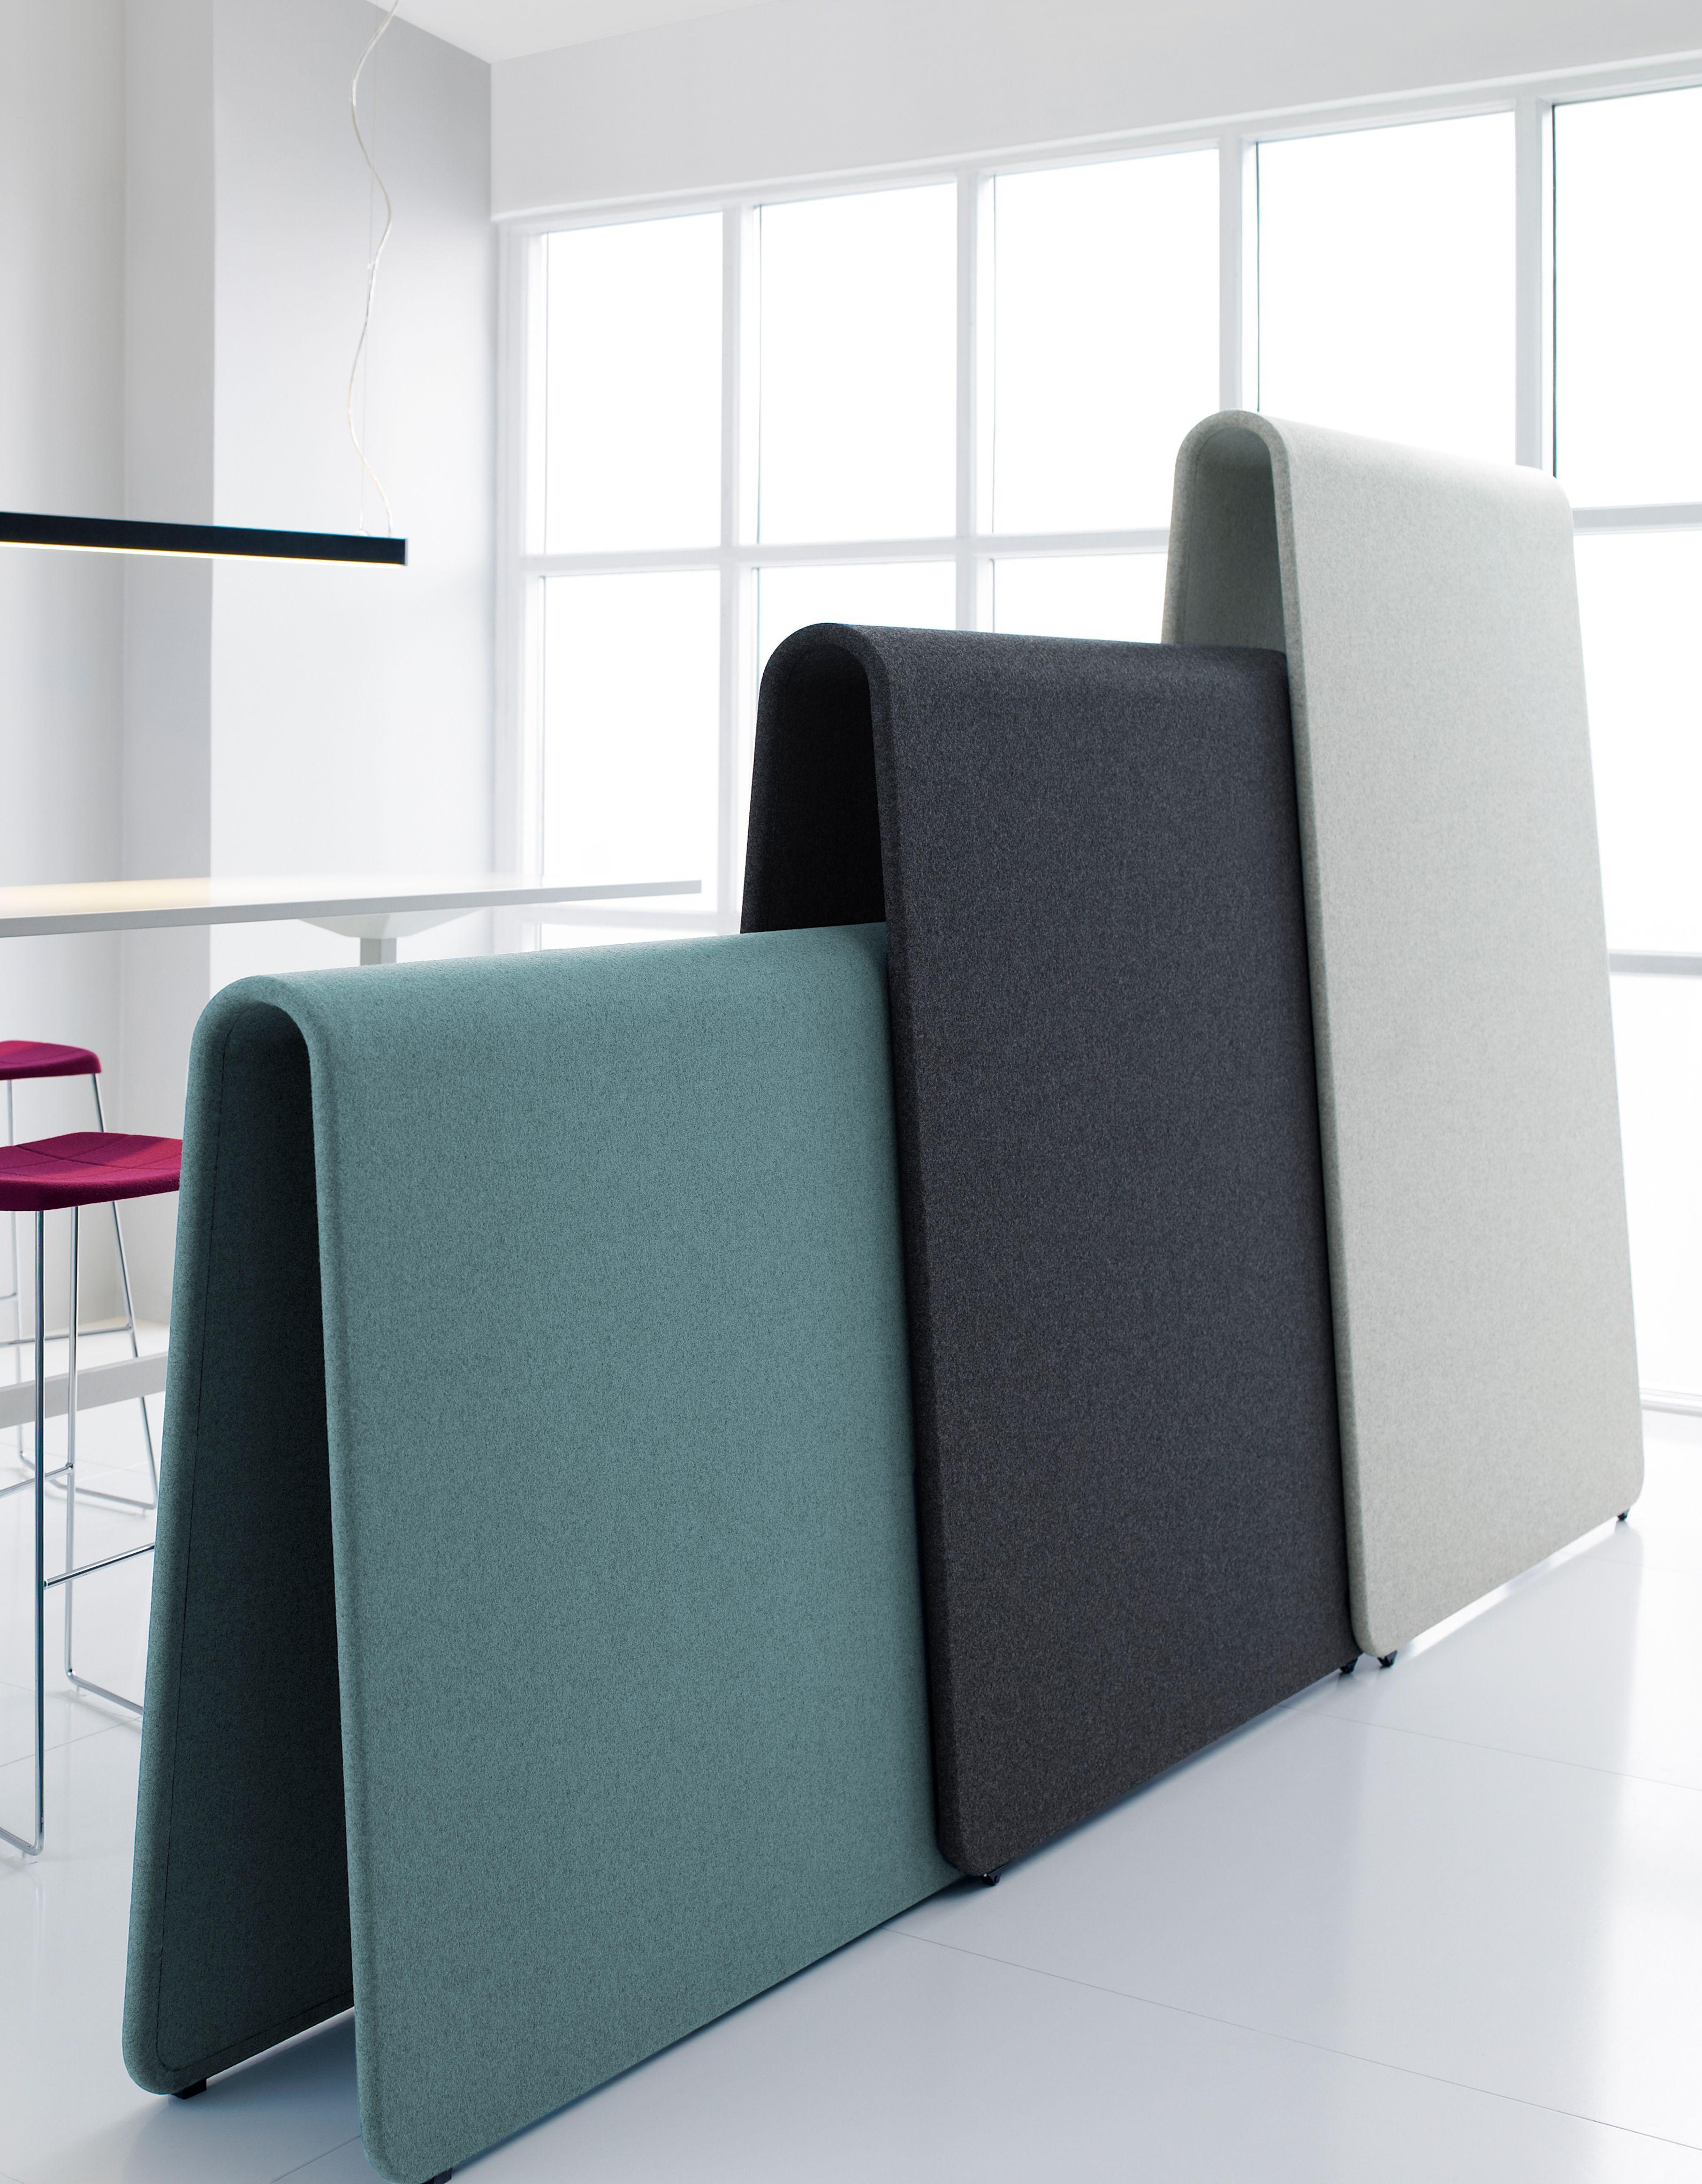 Akustik Modern Office Raumteiler Raum Mobel